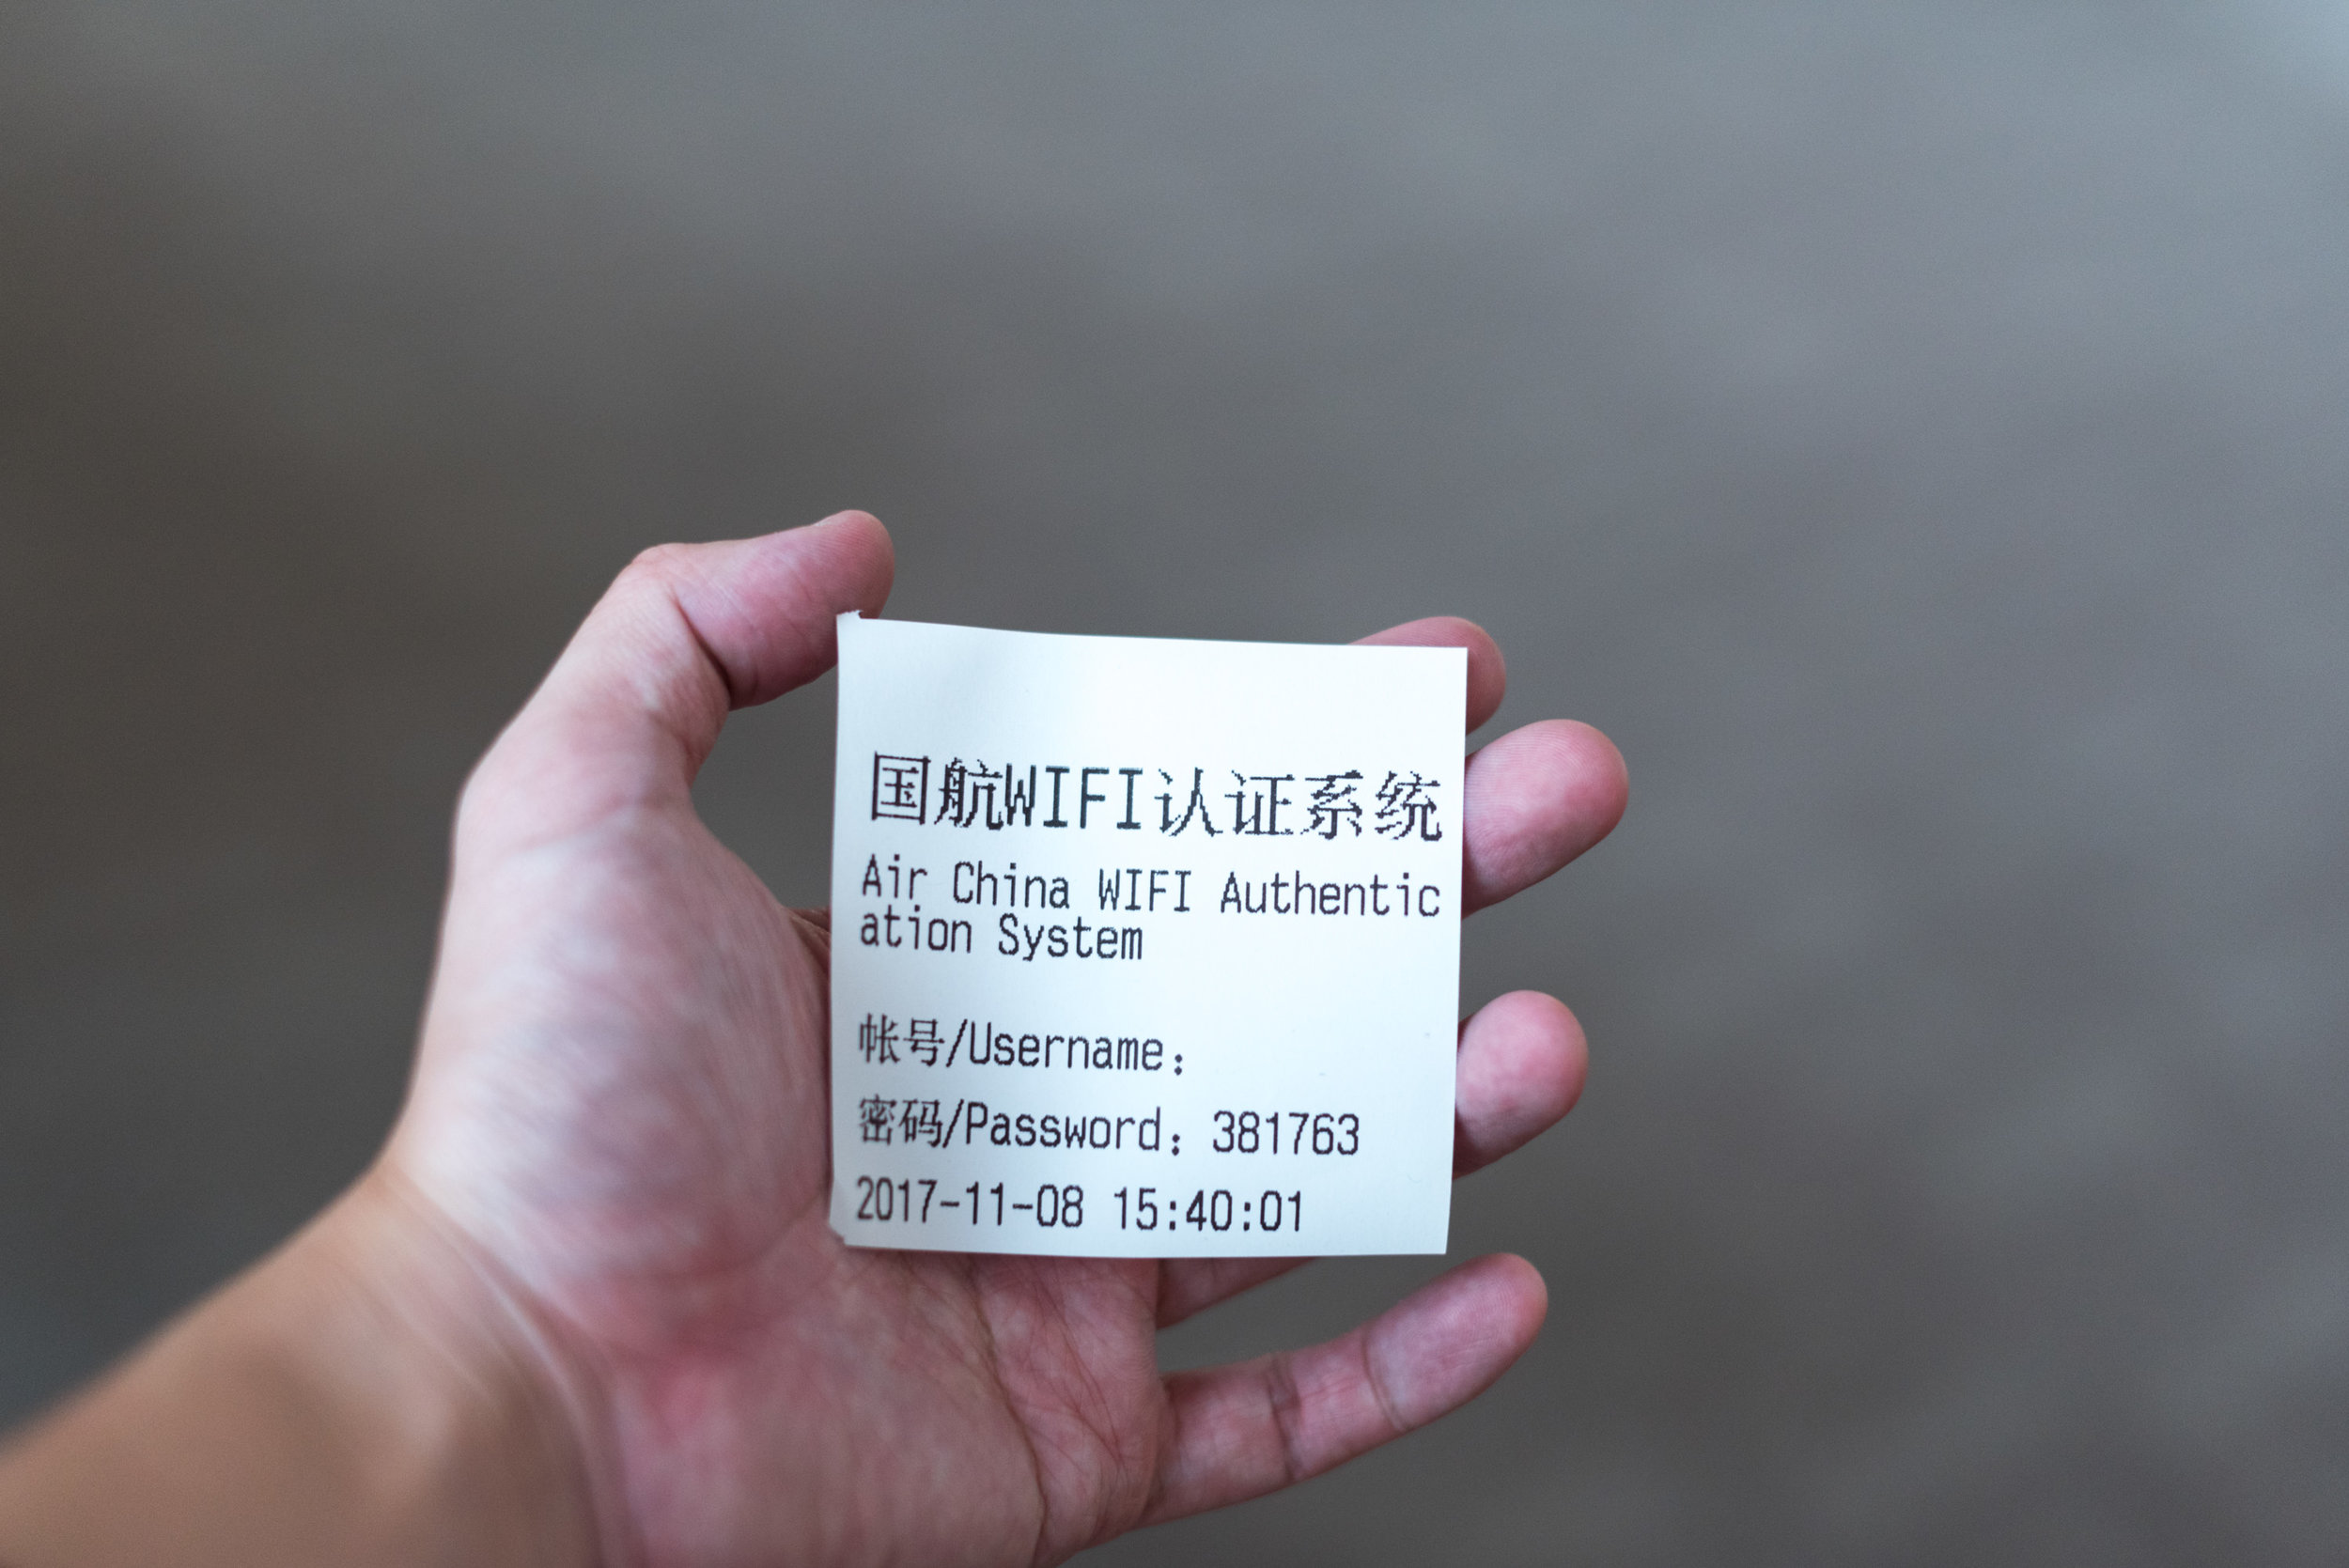 WiFi Access in Lounge  Air China First Class Lounge - Beijing Capital International Airport (PEK)